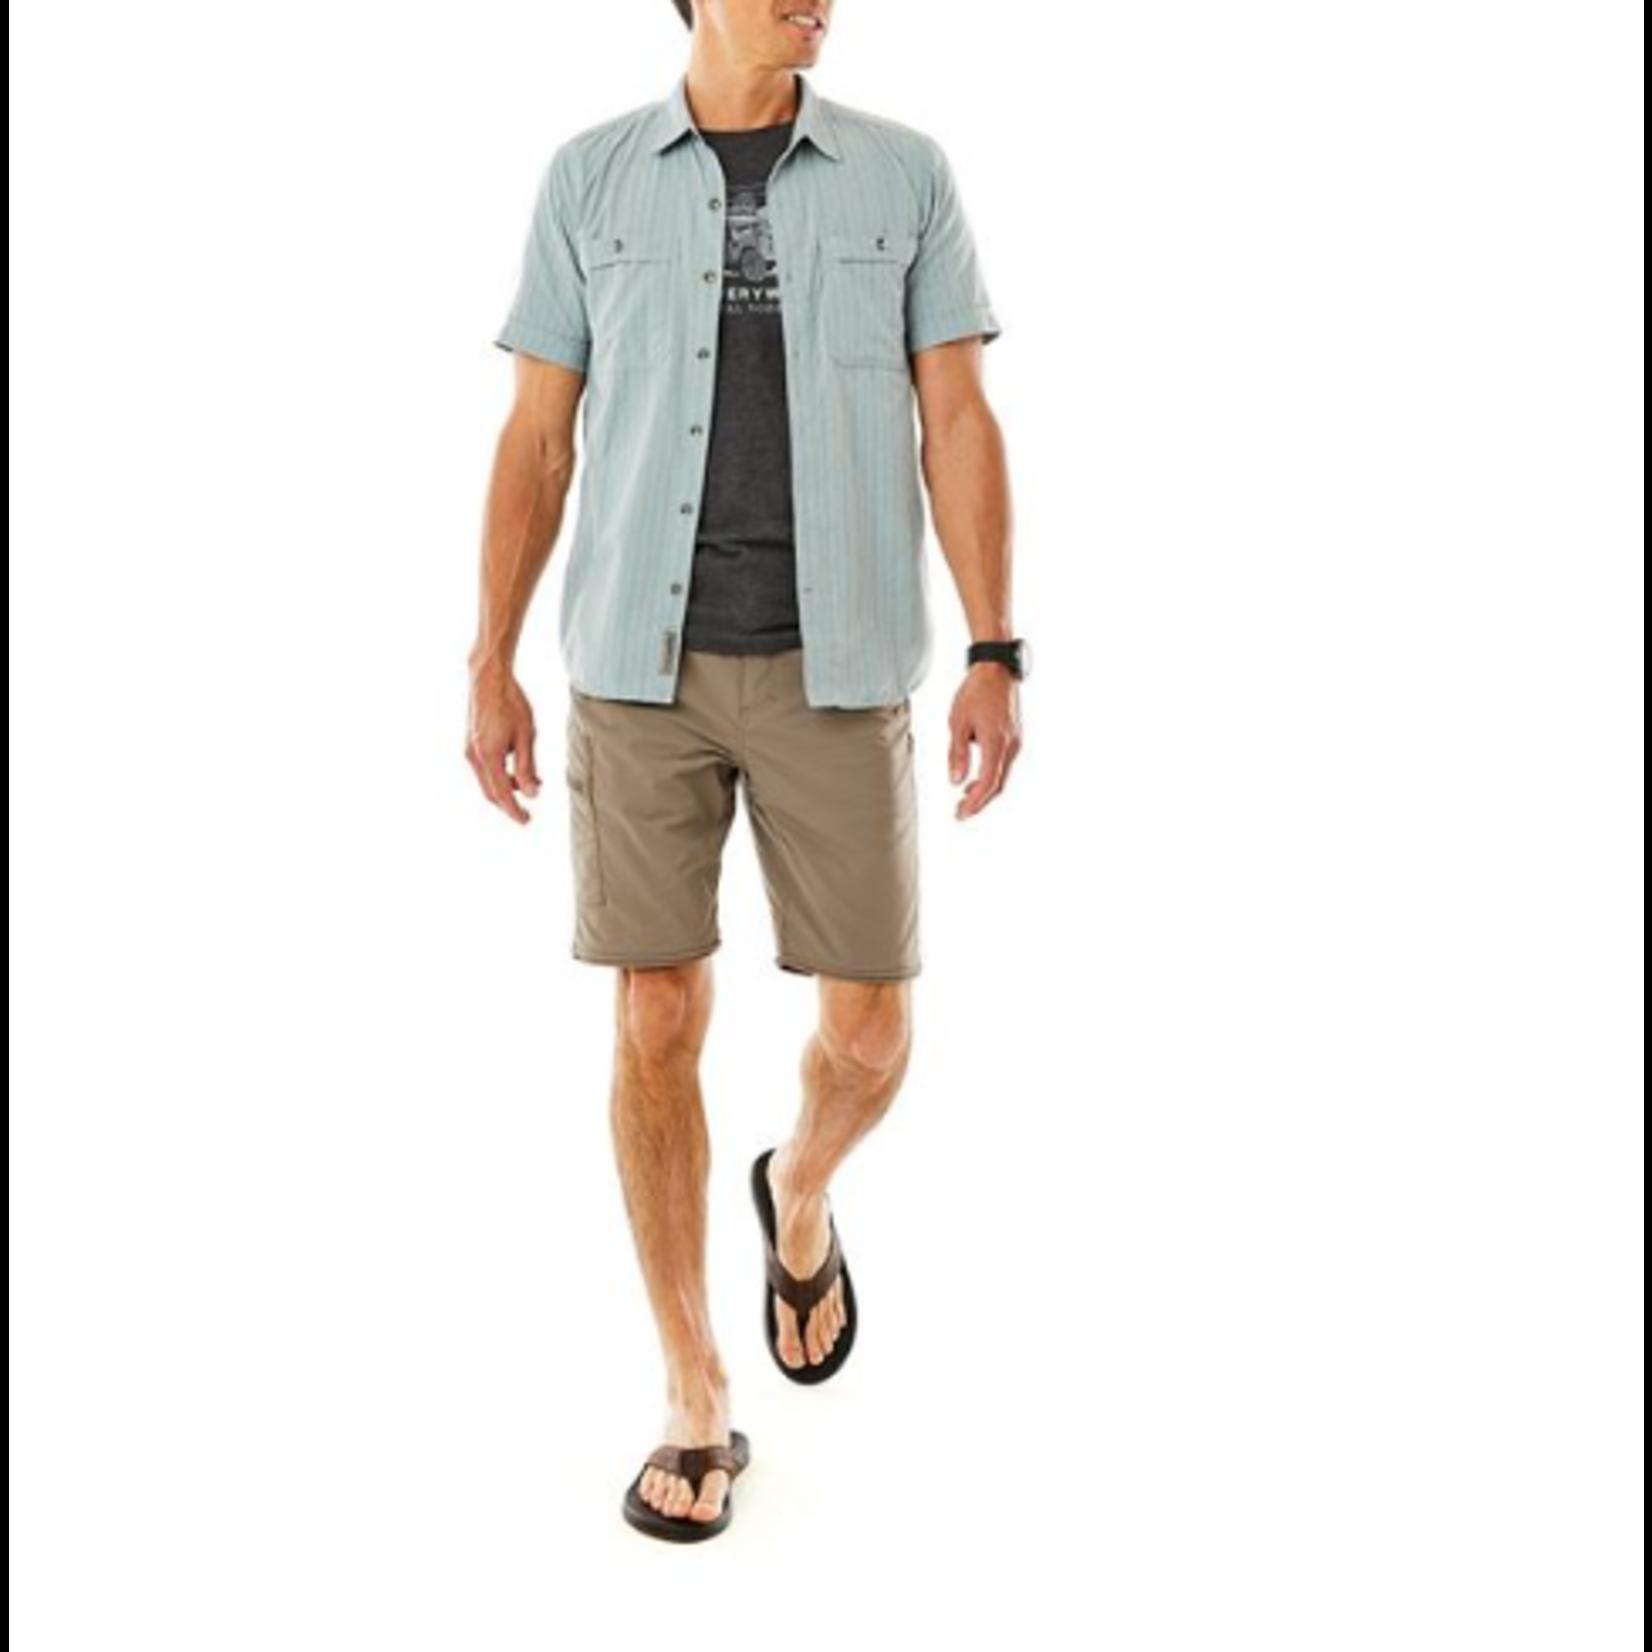 Royal Robbins Men's Active Traveler Zip 'n' Go Pant